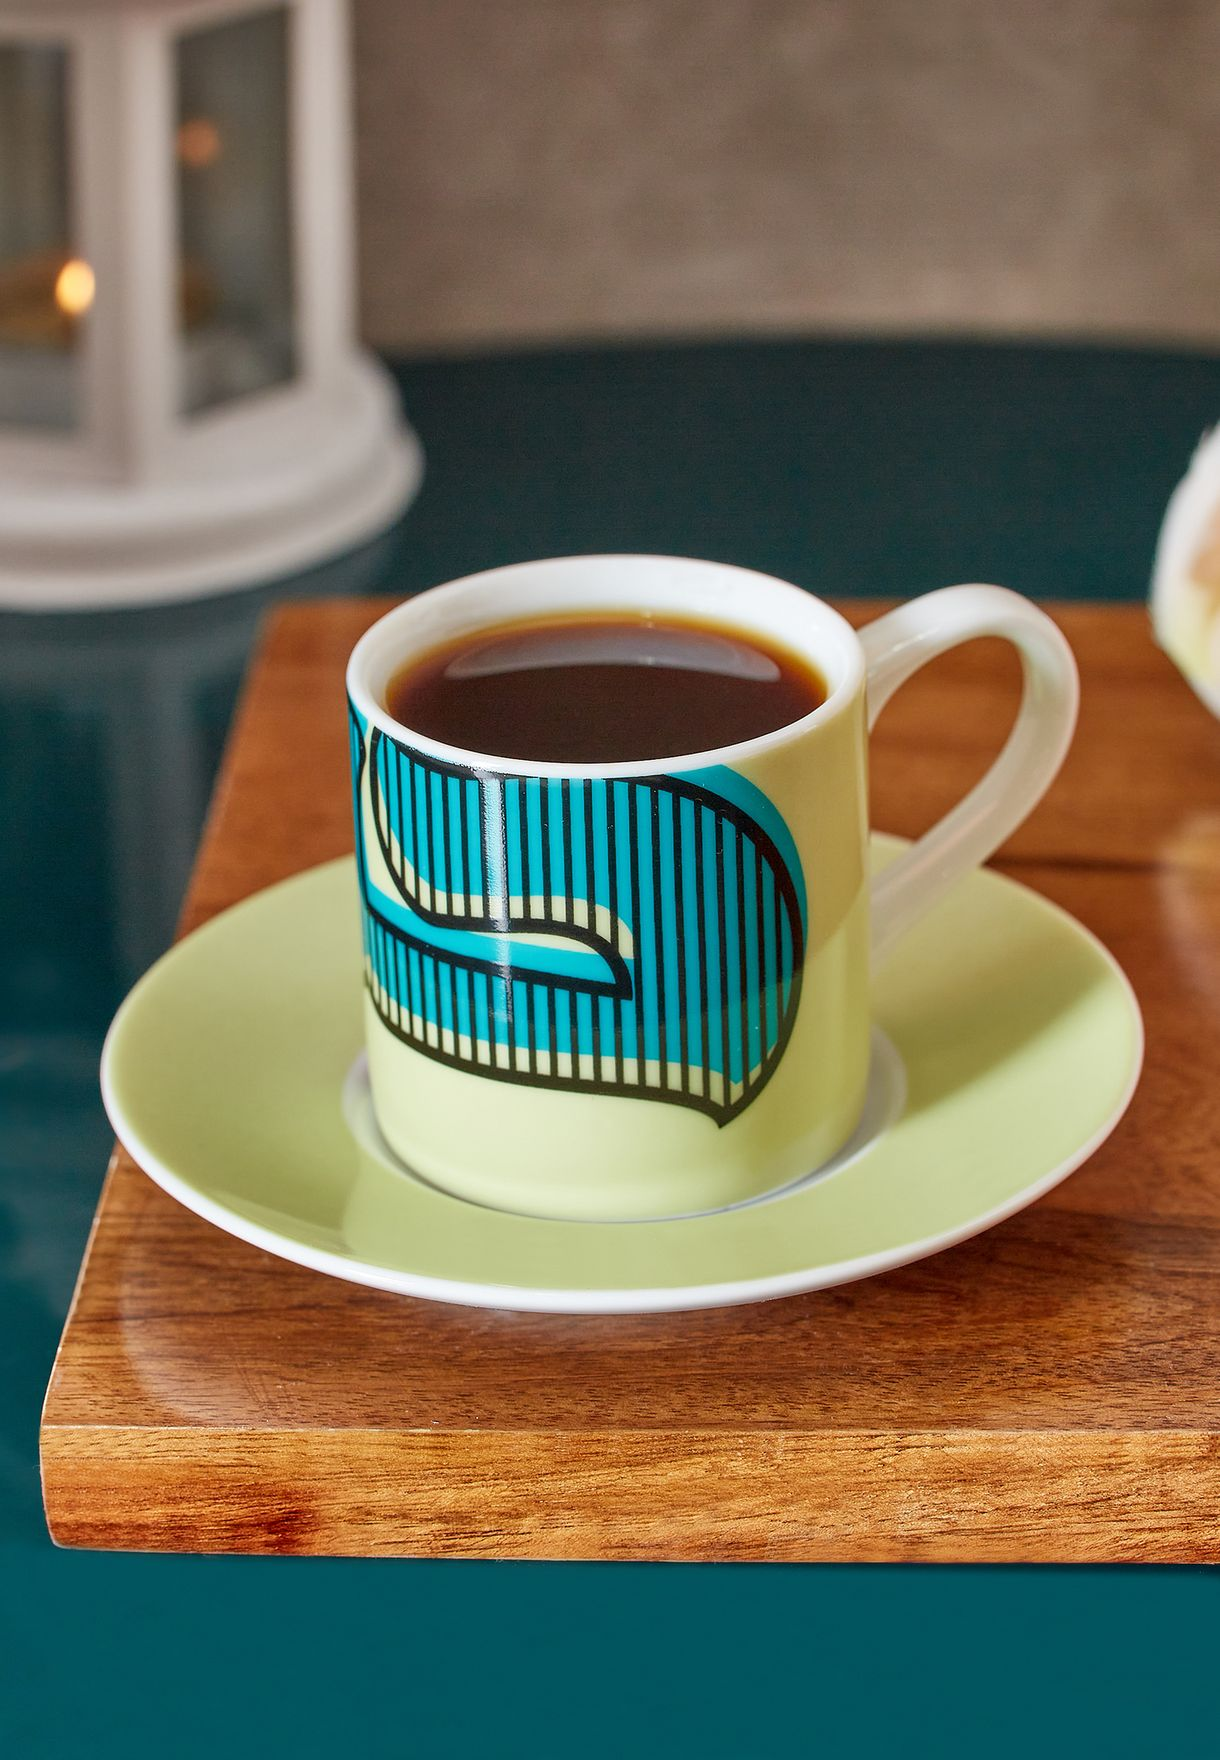 Hubb Espresso Cup & Saucer Set